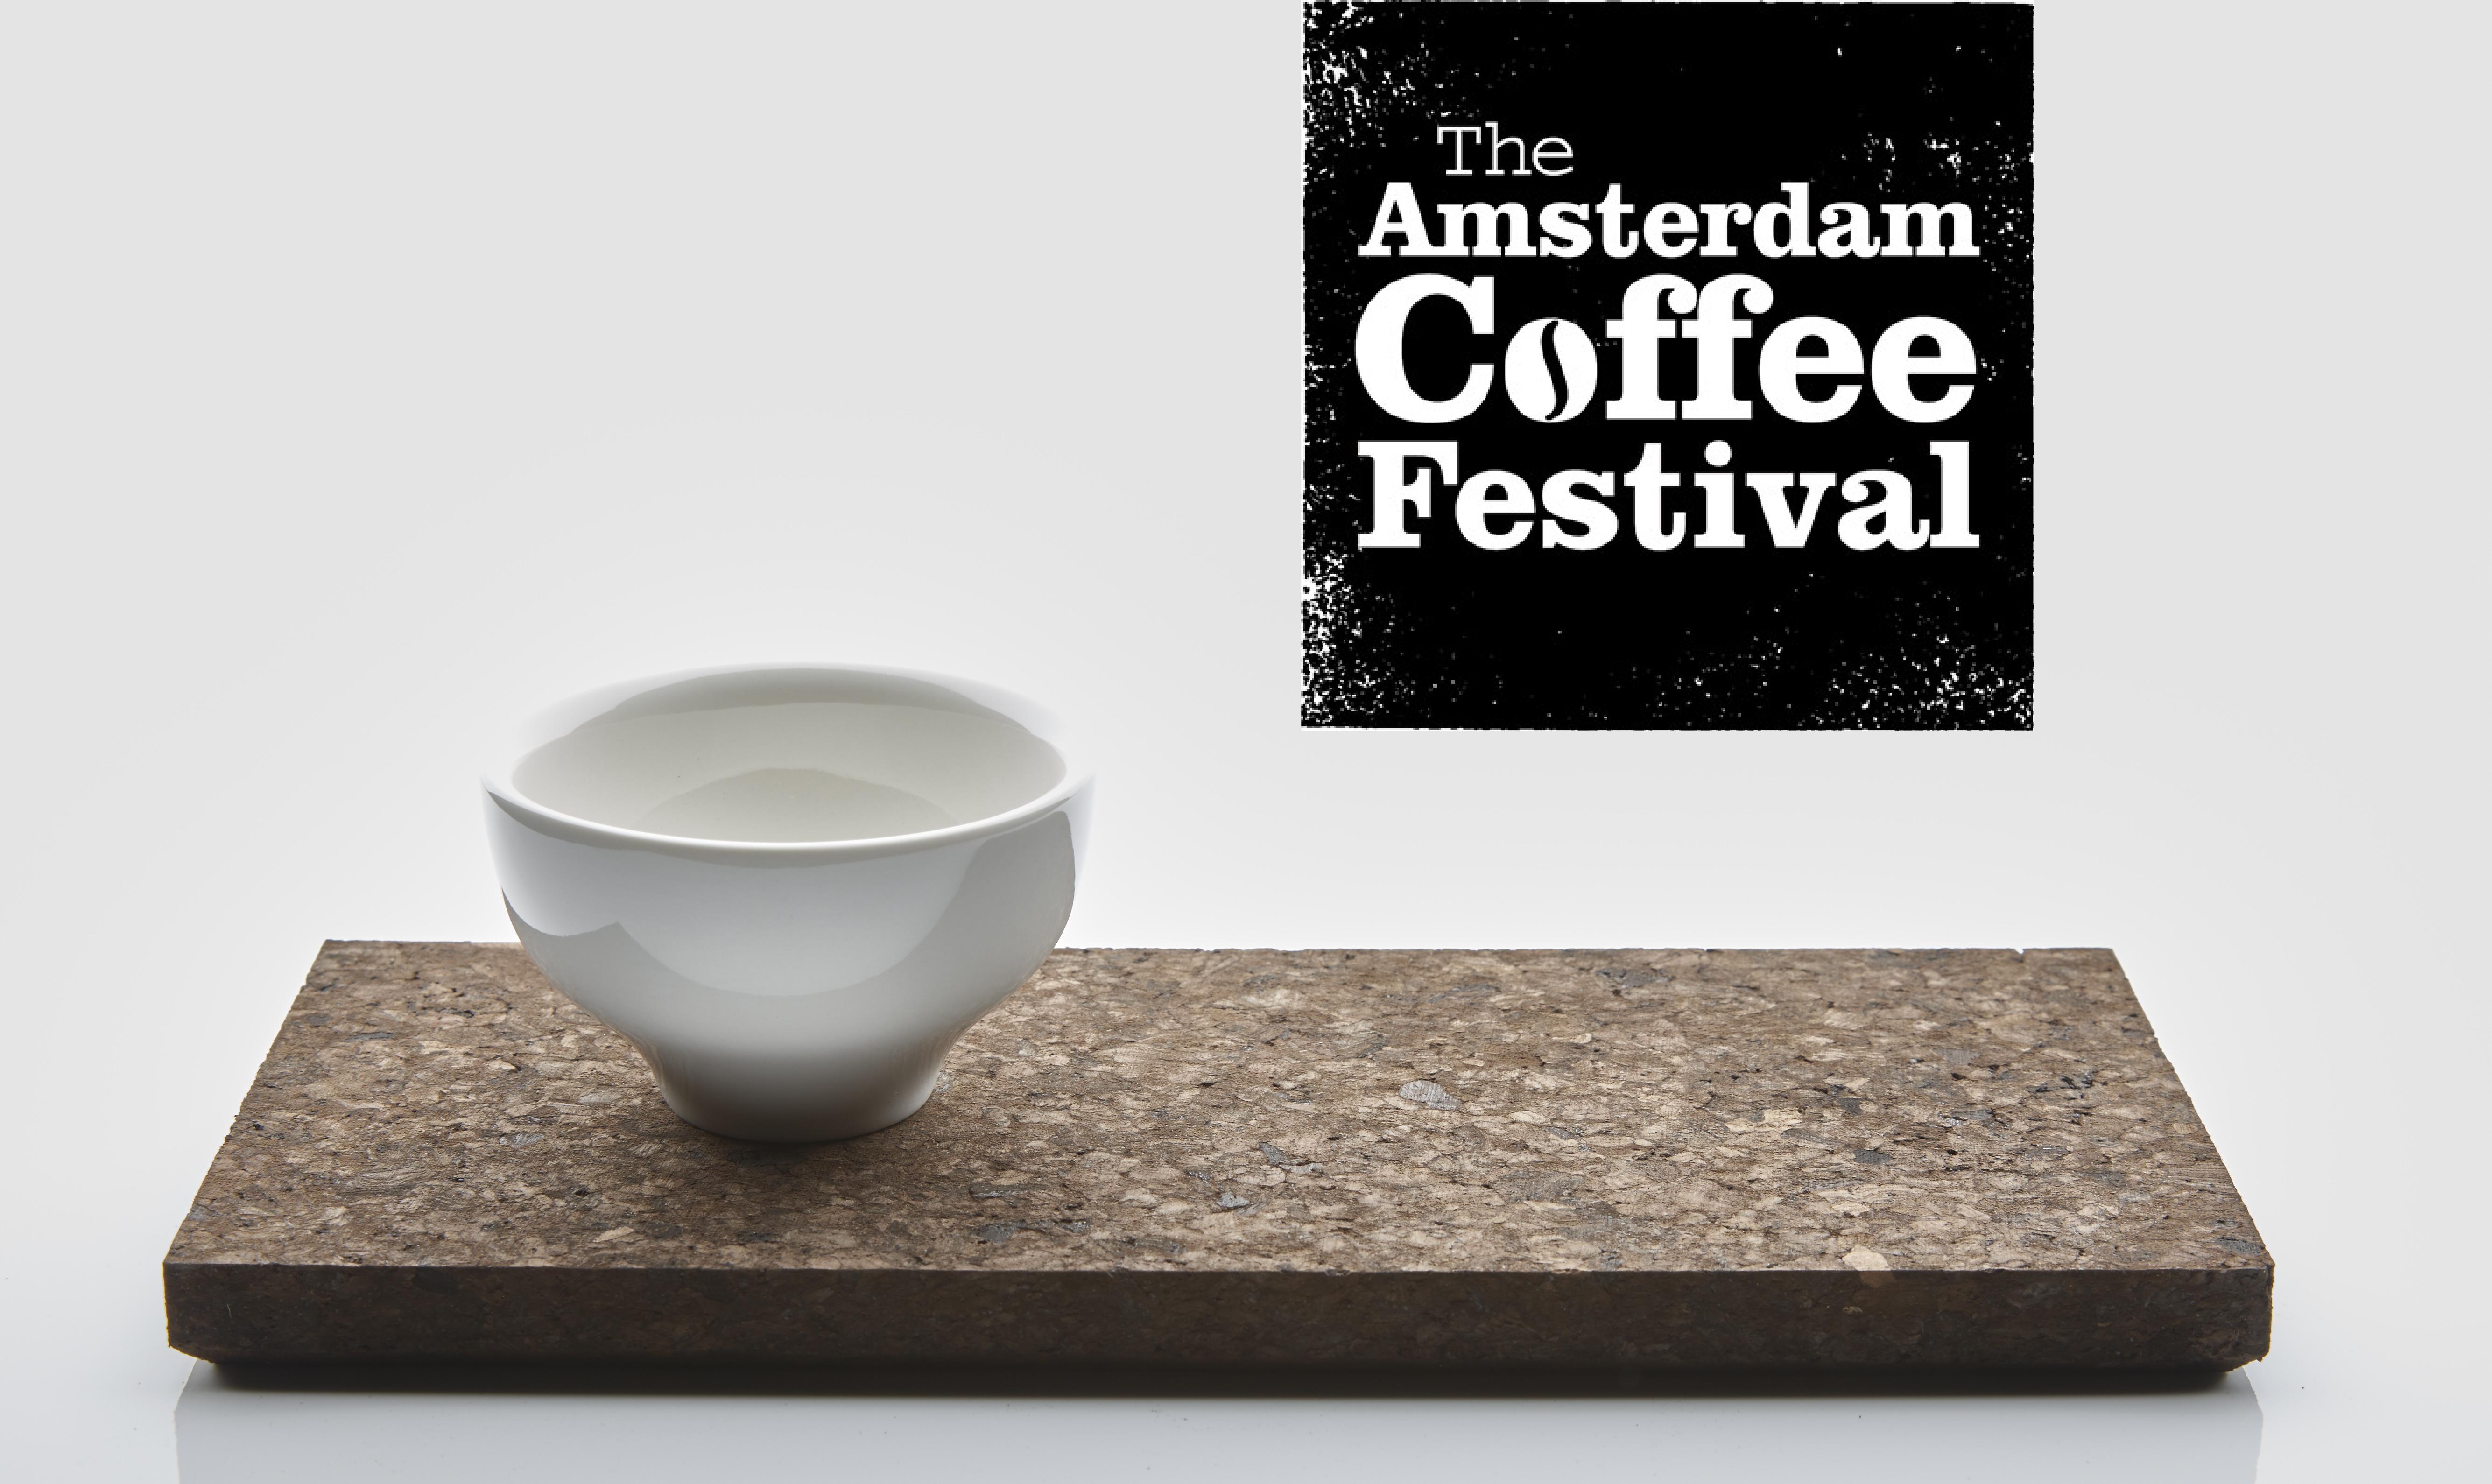 Maarten Baptist @ The Amsterdam Coffee Festival 2017